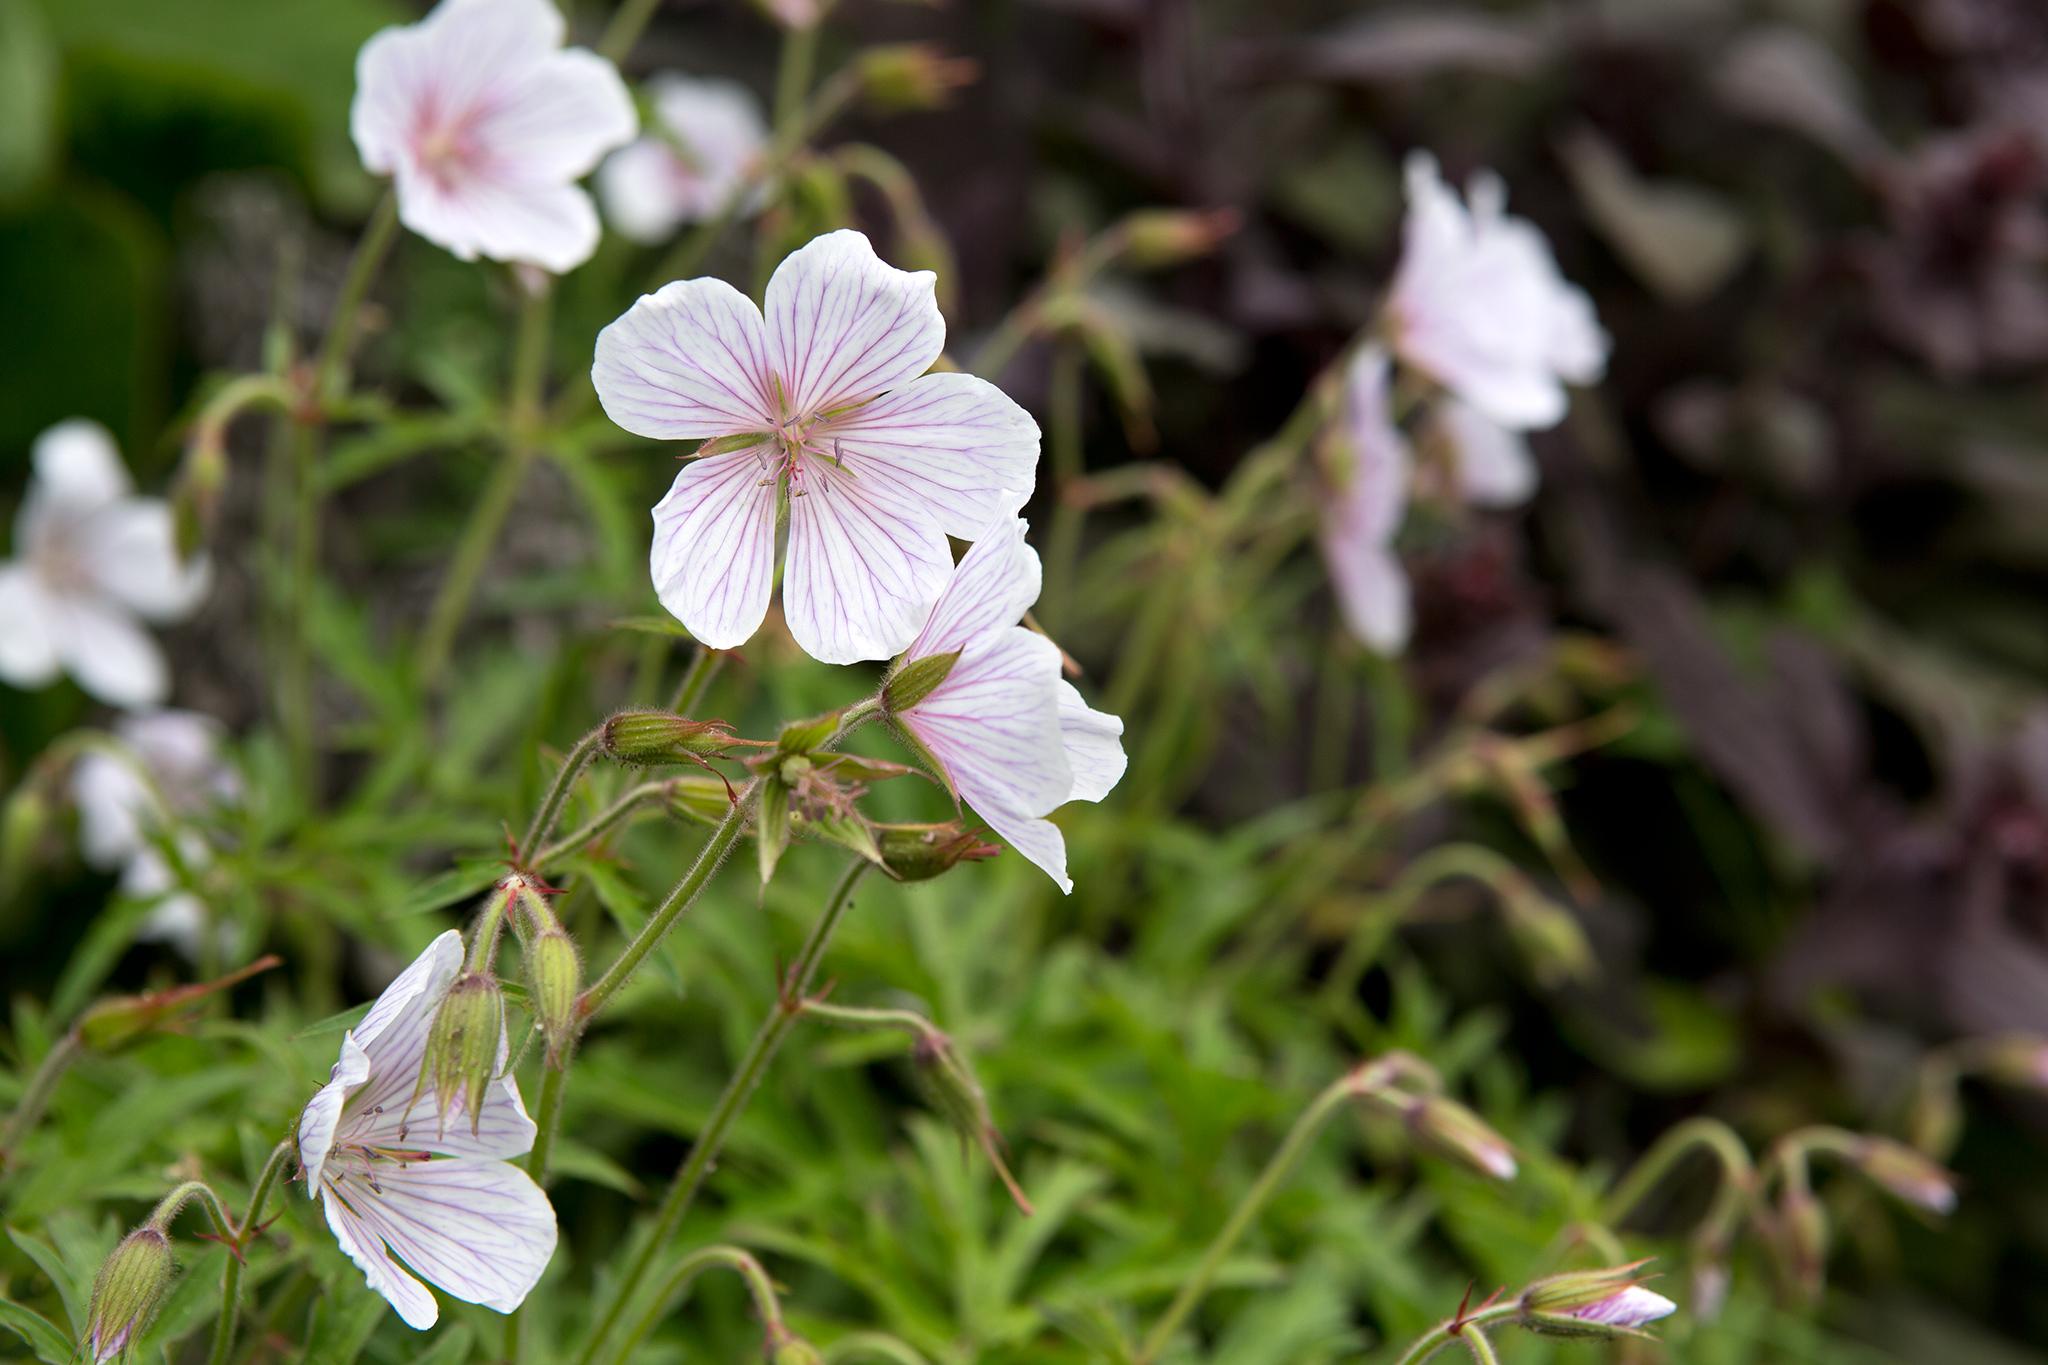 geranium-kashmir-white-2